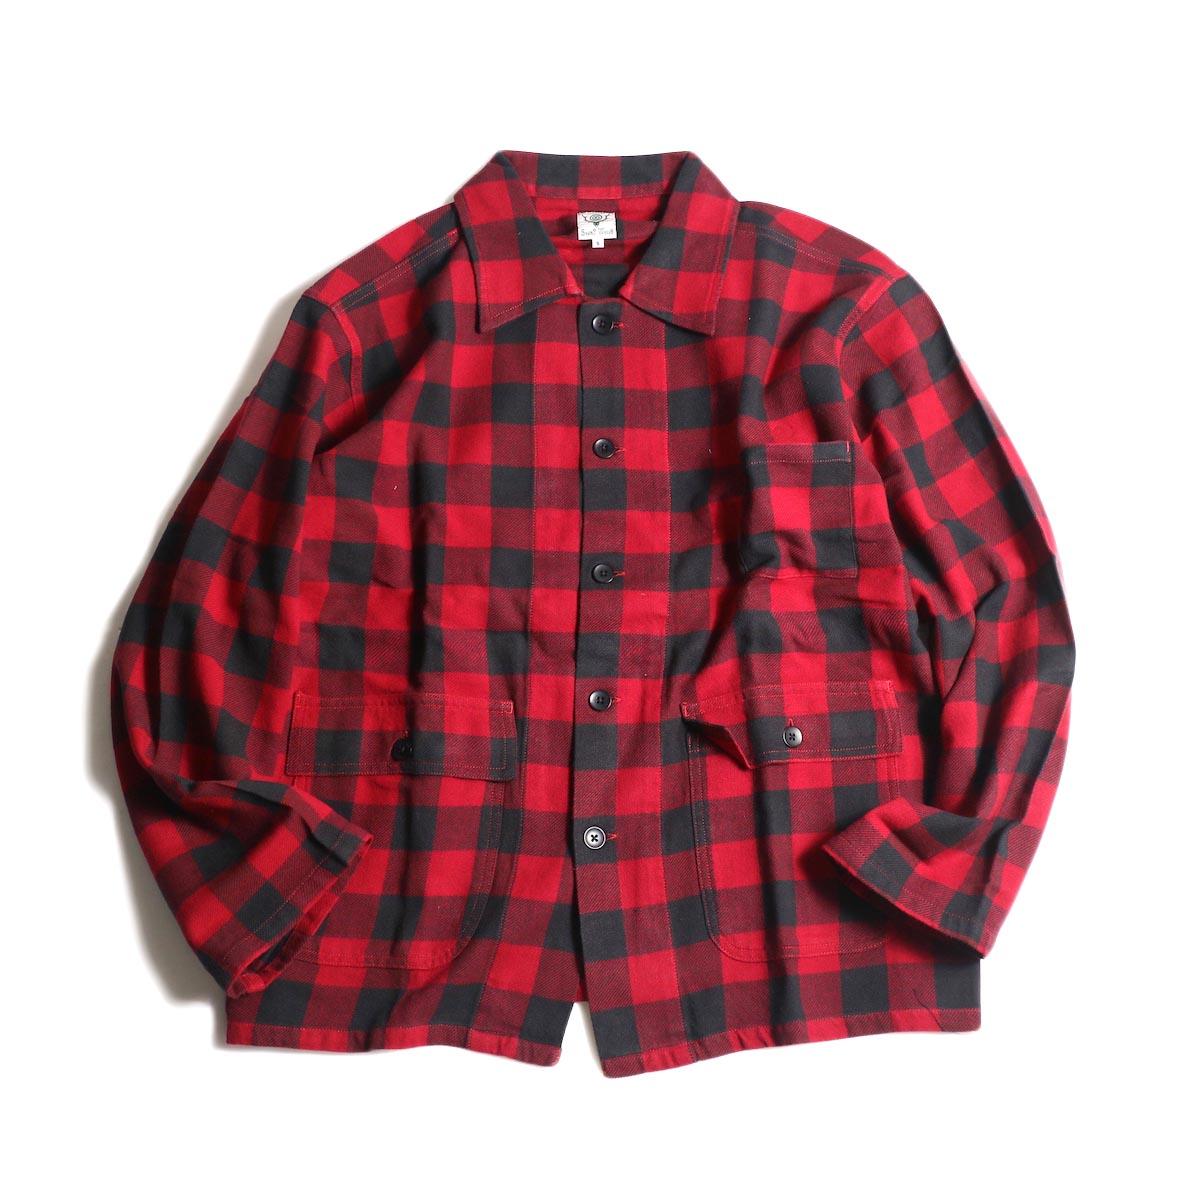 South2 West8 / Hunting Shirt -Plaid Twill (Red/Black)